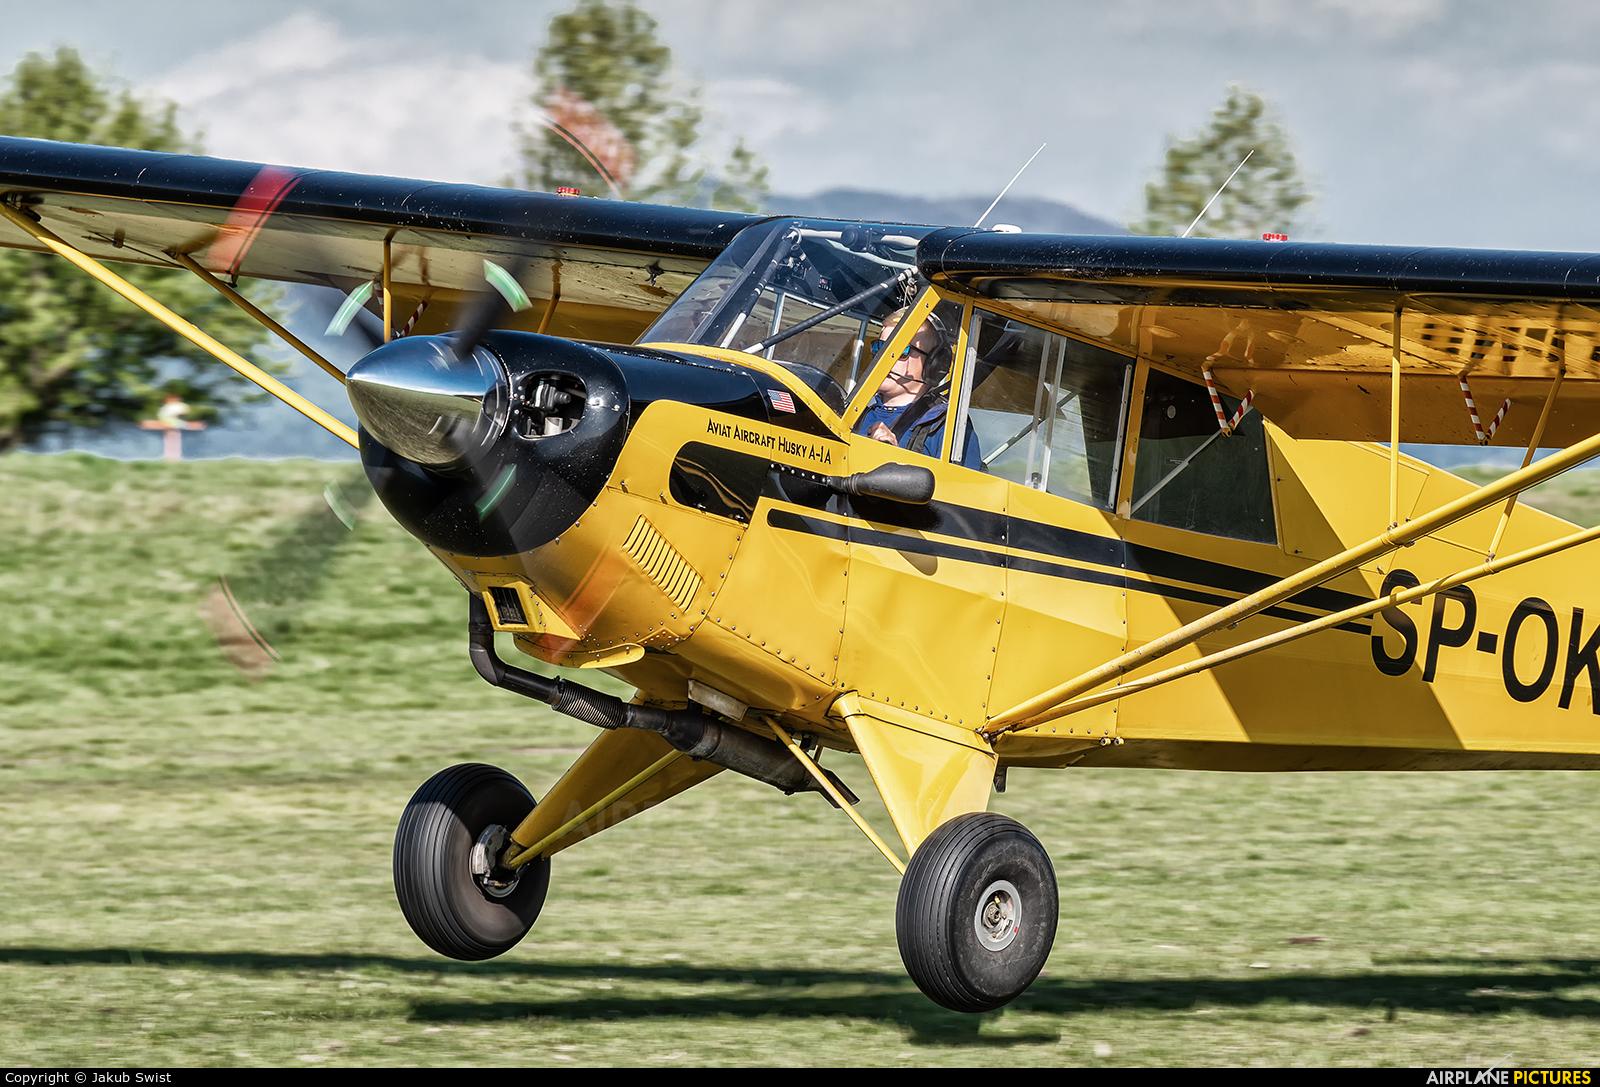 Aeroklub Nowy Targ SP-OKO aircraft at Nowy Targ Airport